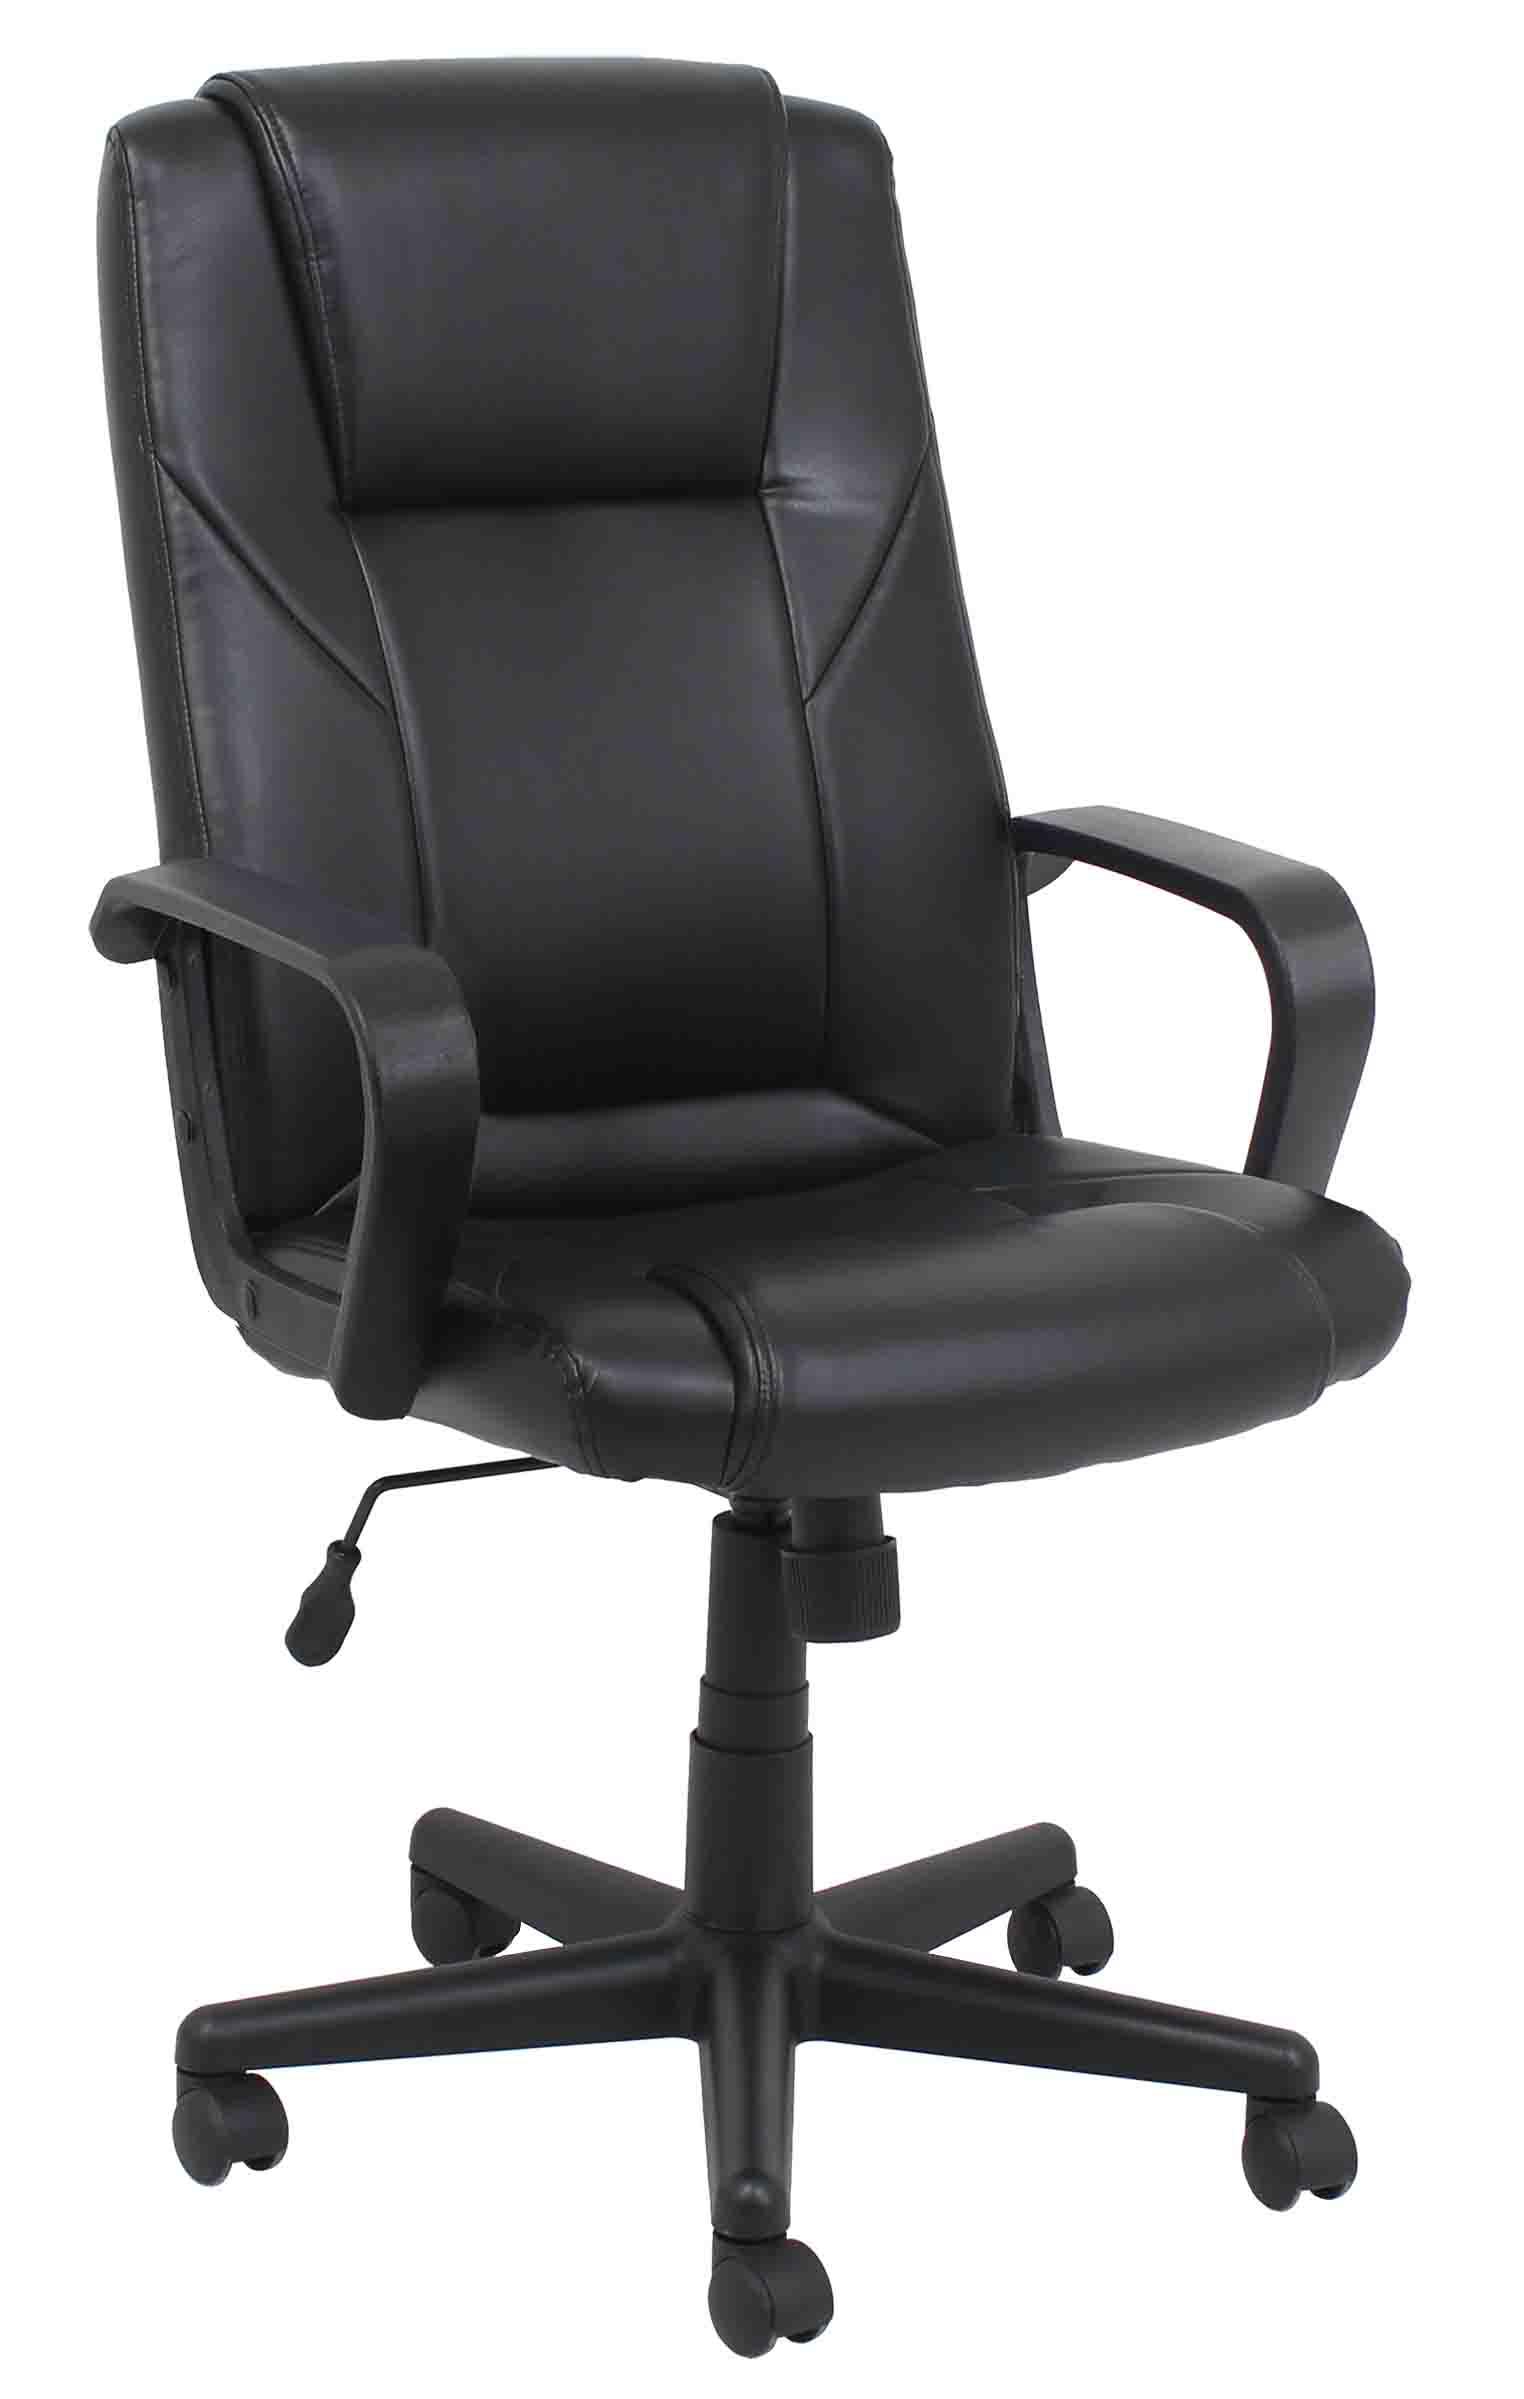 TCI Furniture Chairs & Seating Dana Task Chair